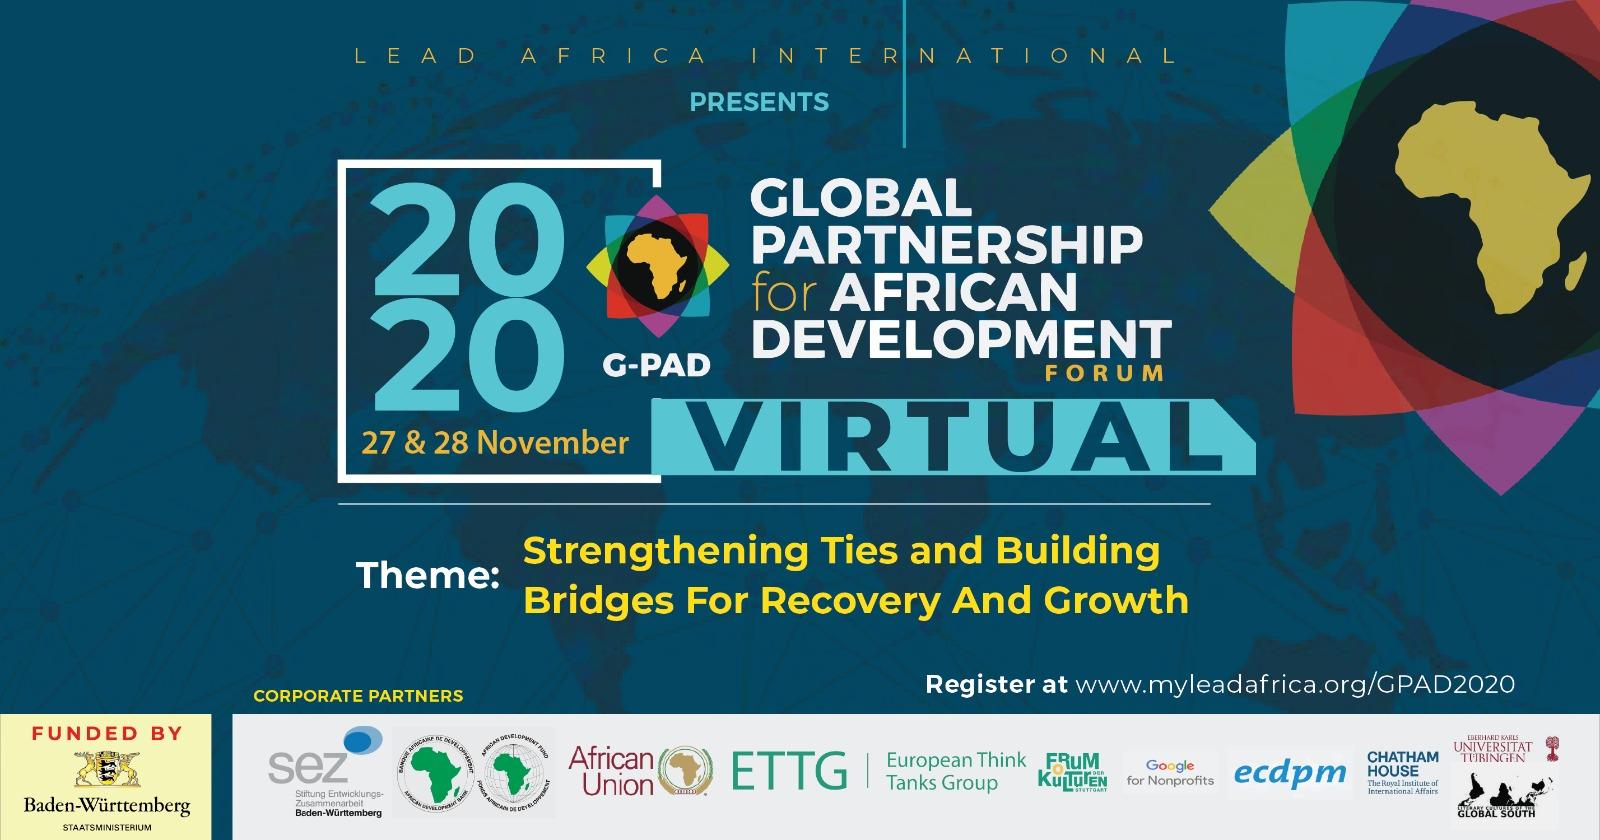 Lead Africa International